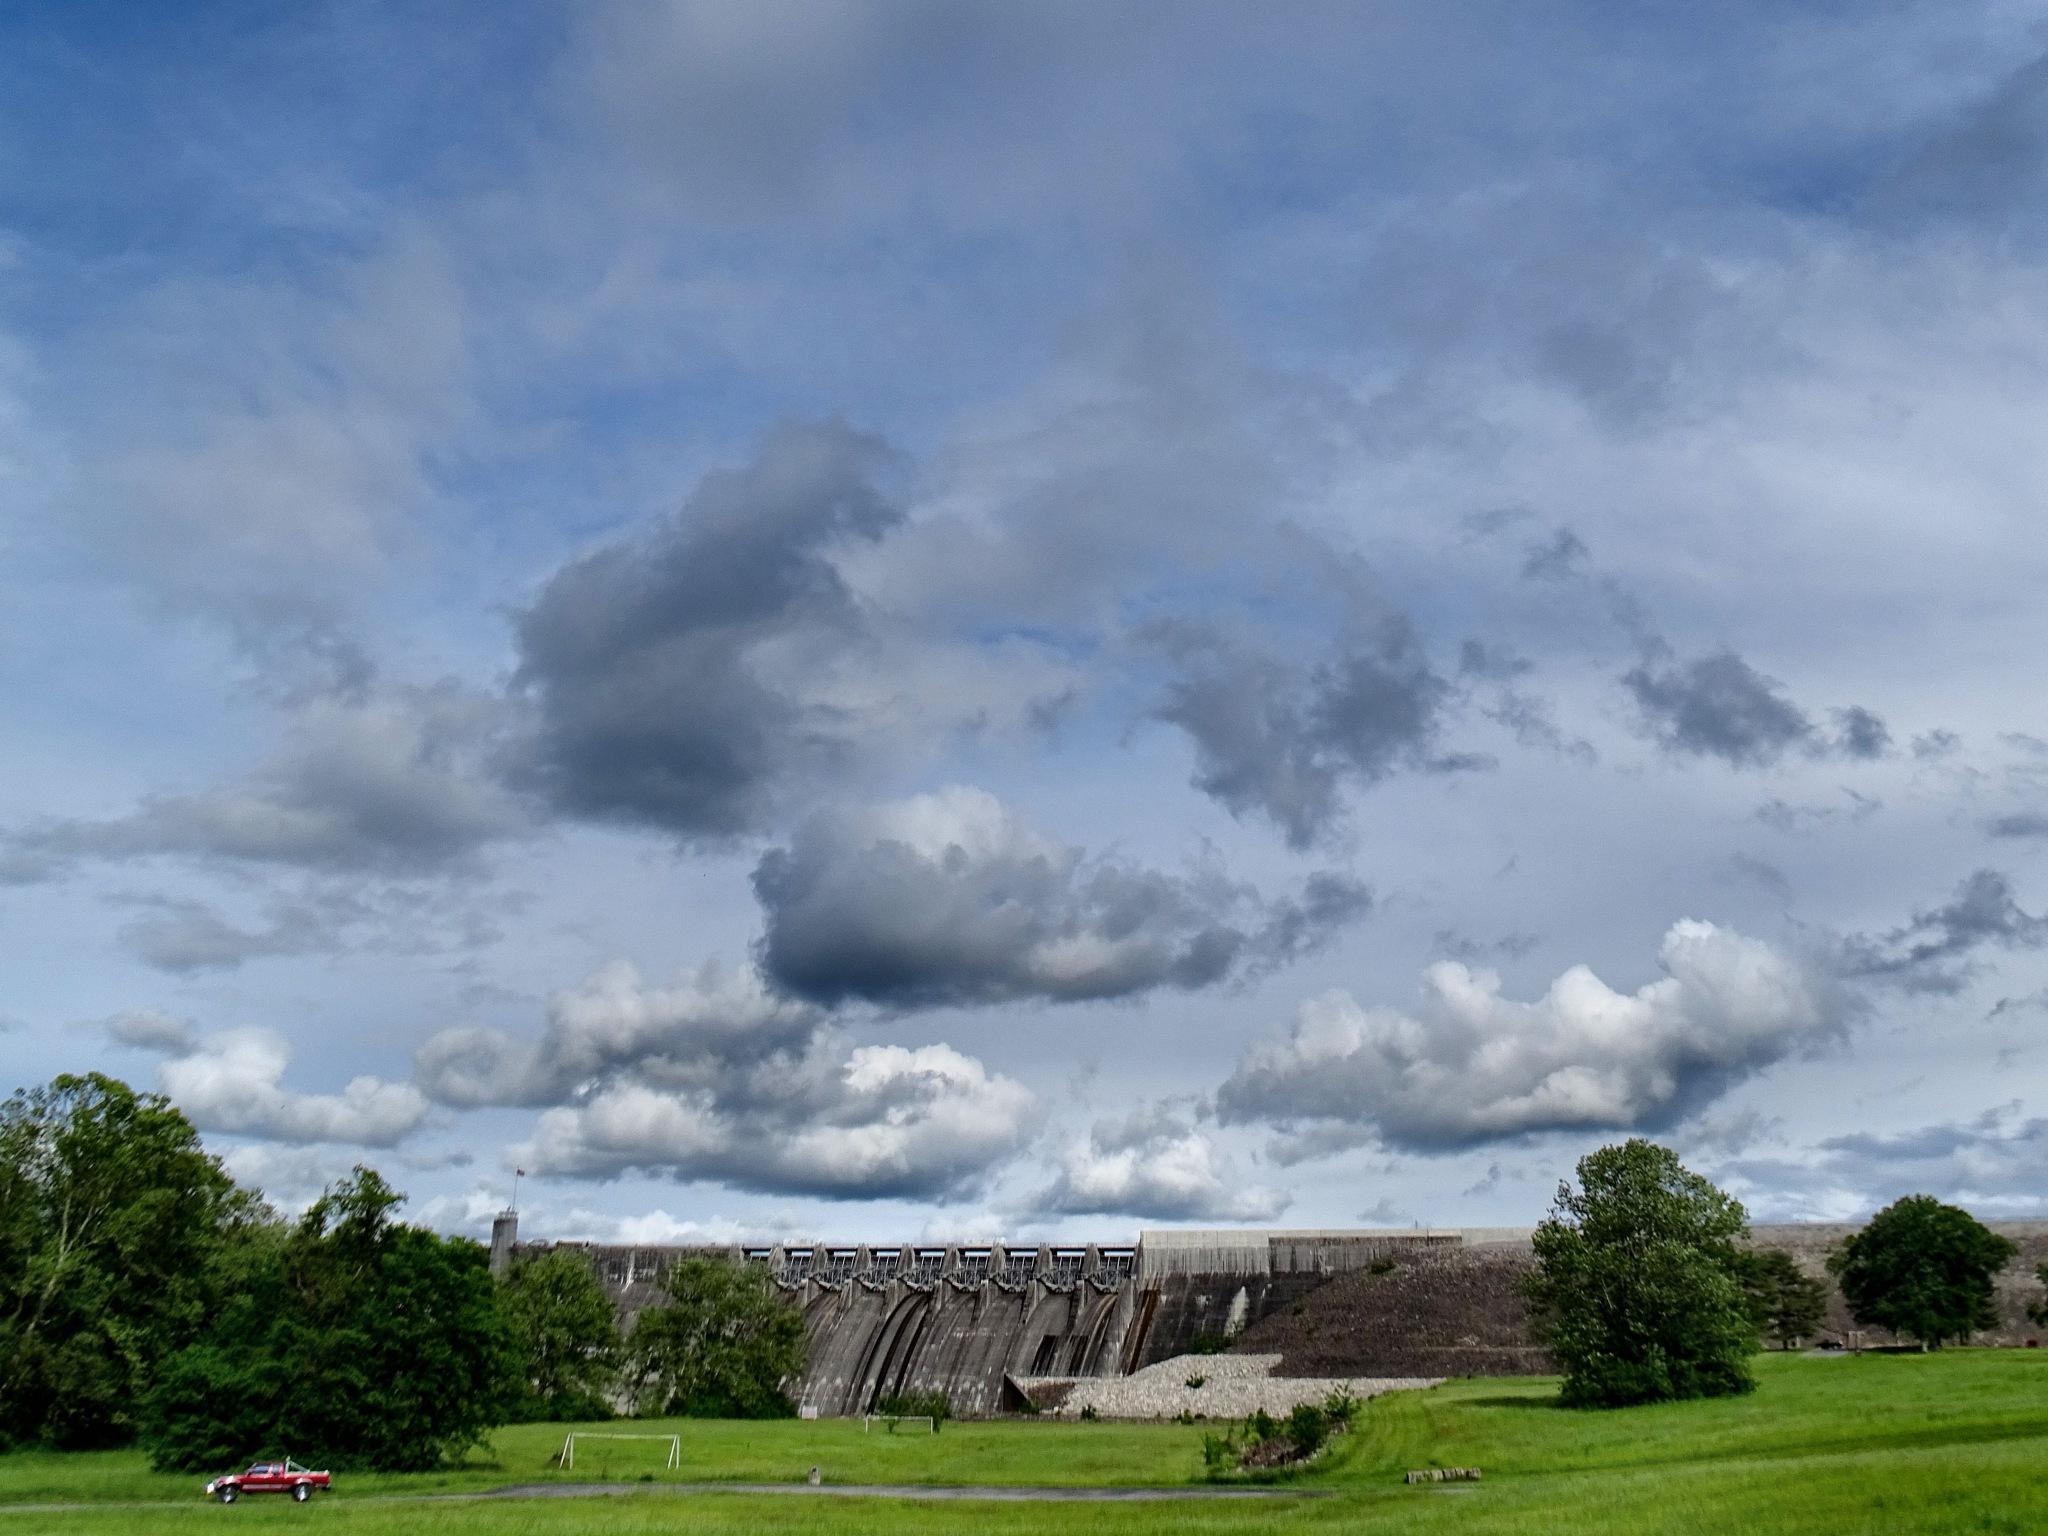 Cherokee Dam Jefferson County, Tennessee by Patty Stockton